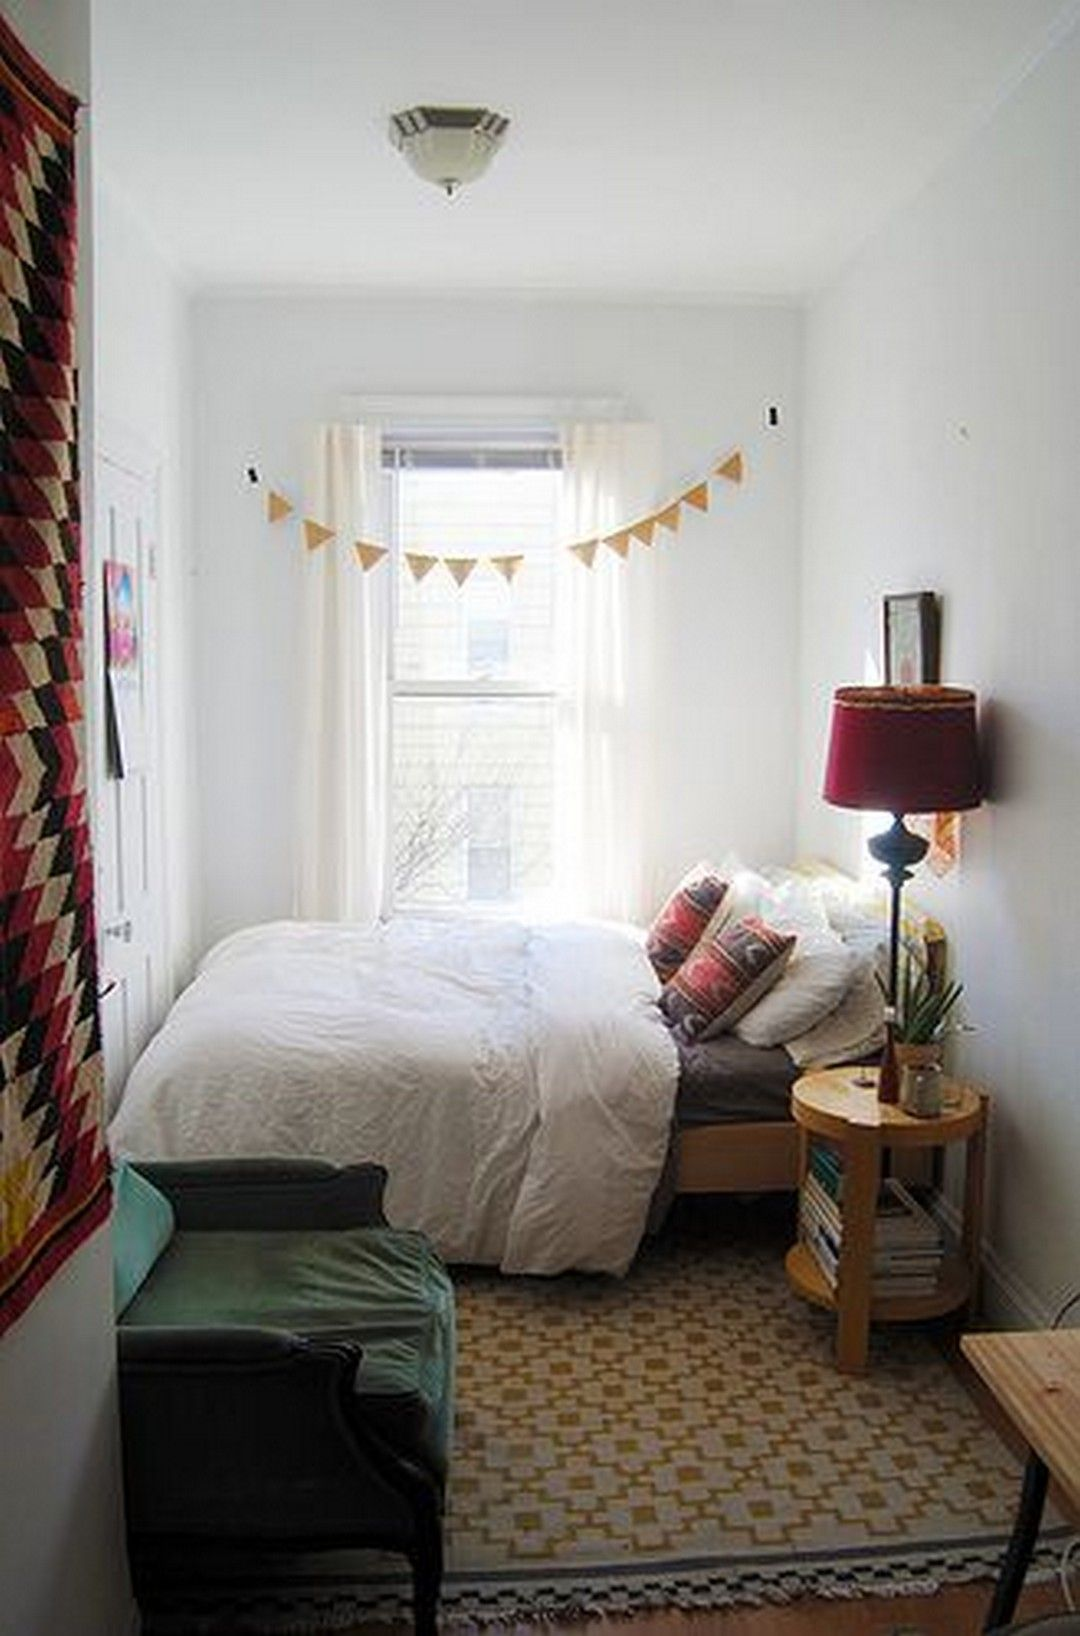 92 Elegant Cozy Bedroom Ideas with Small Spaces   Bedroom ...